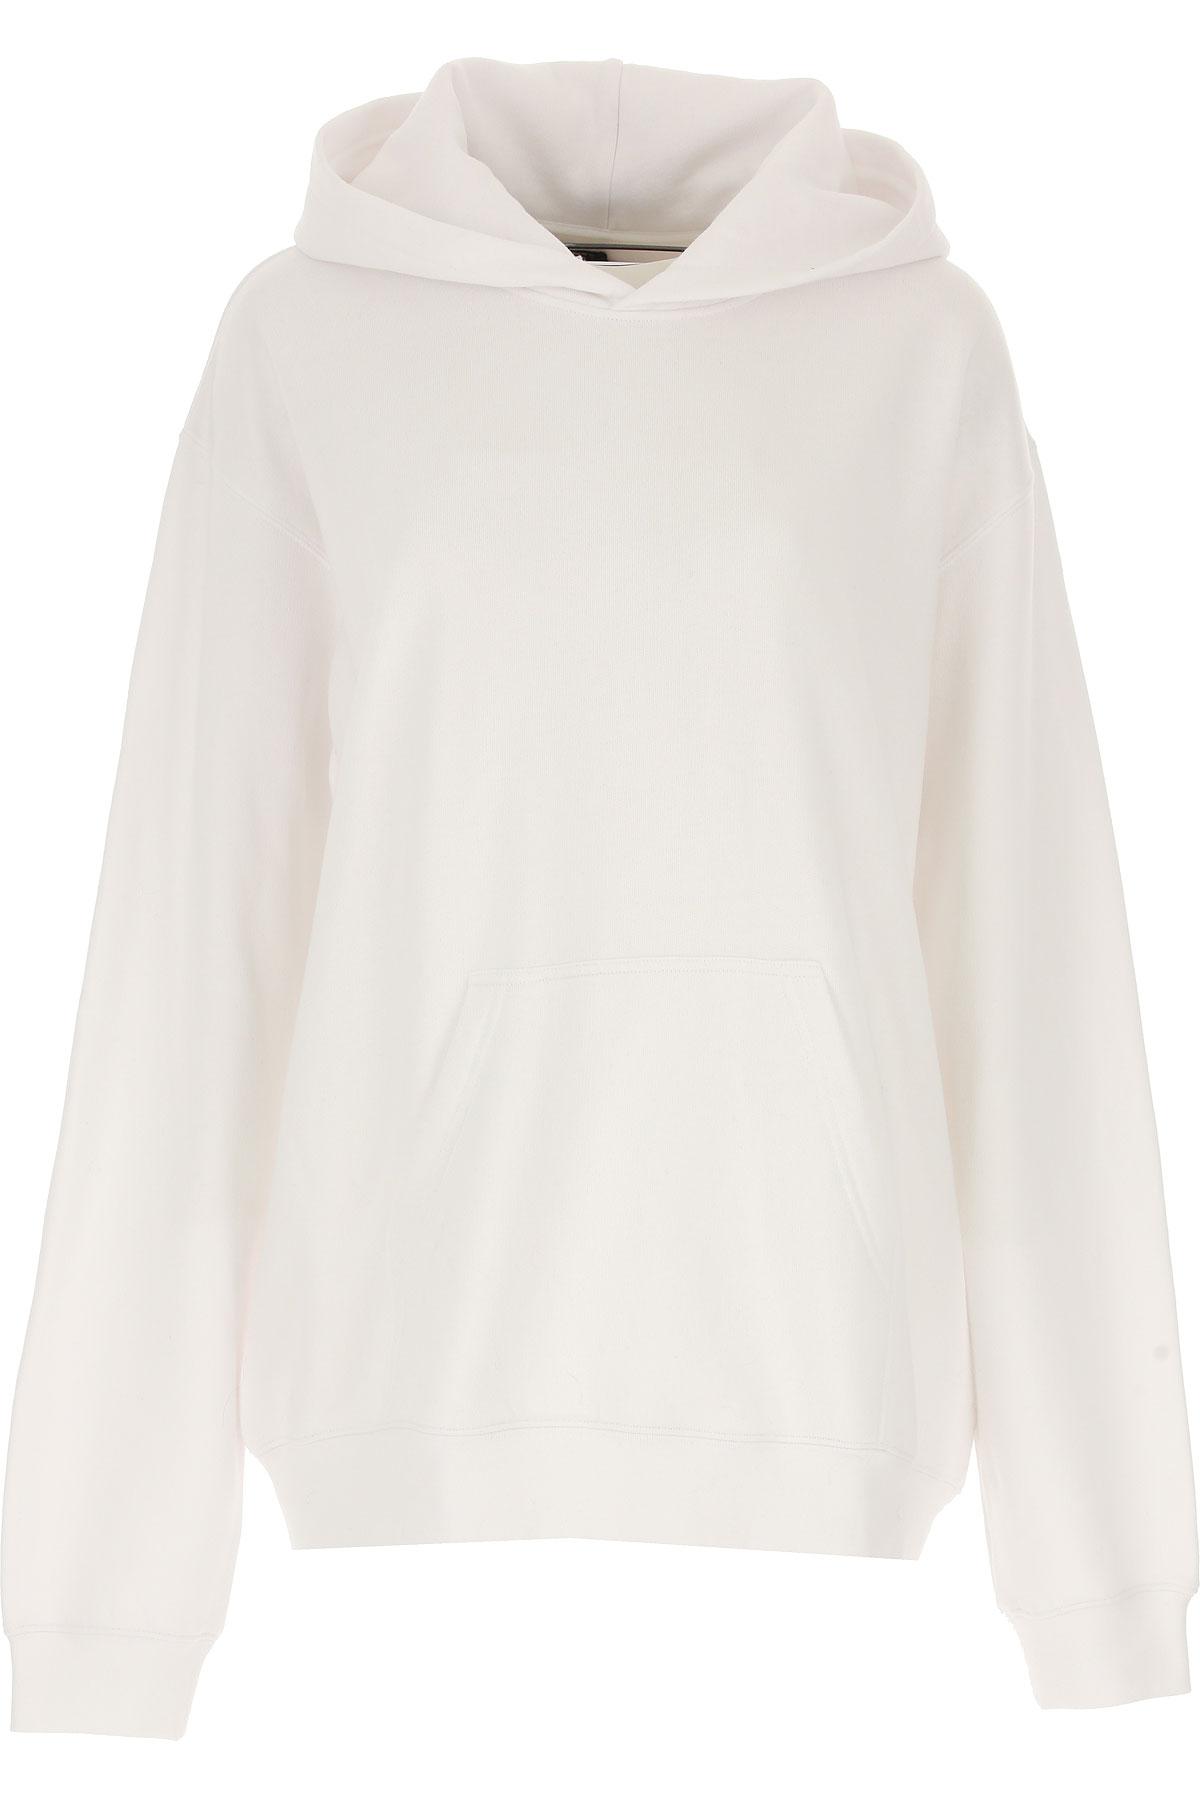 Image of RtA Sweatshirt for Women, White, Cotton, 2017, 2 4 6 8